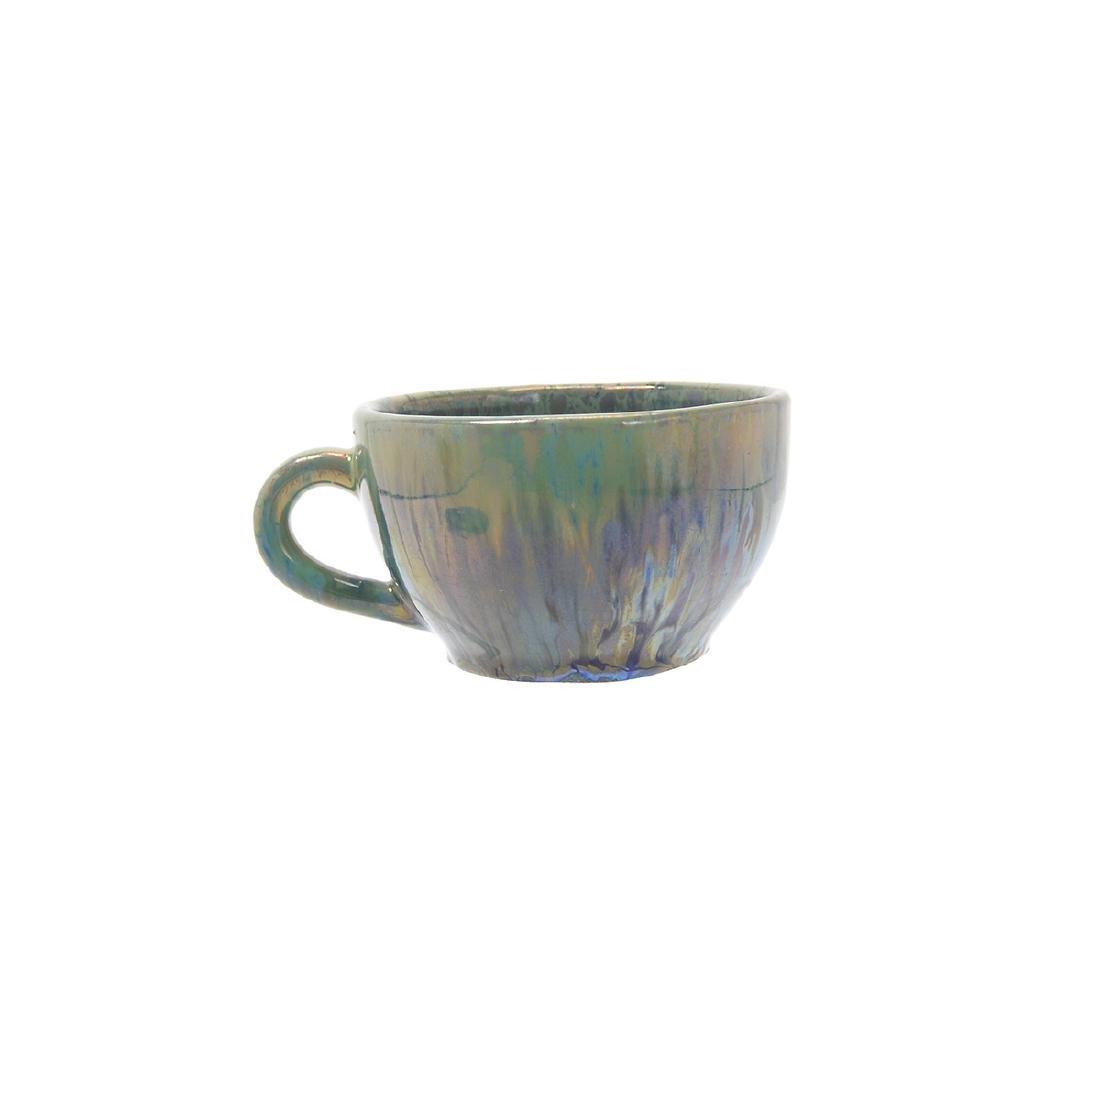 Alphonse Cytere Iridescent Art Pottery Tea Service - 5